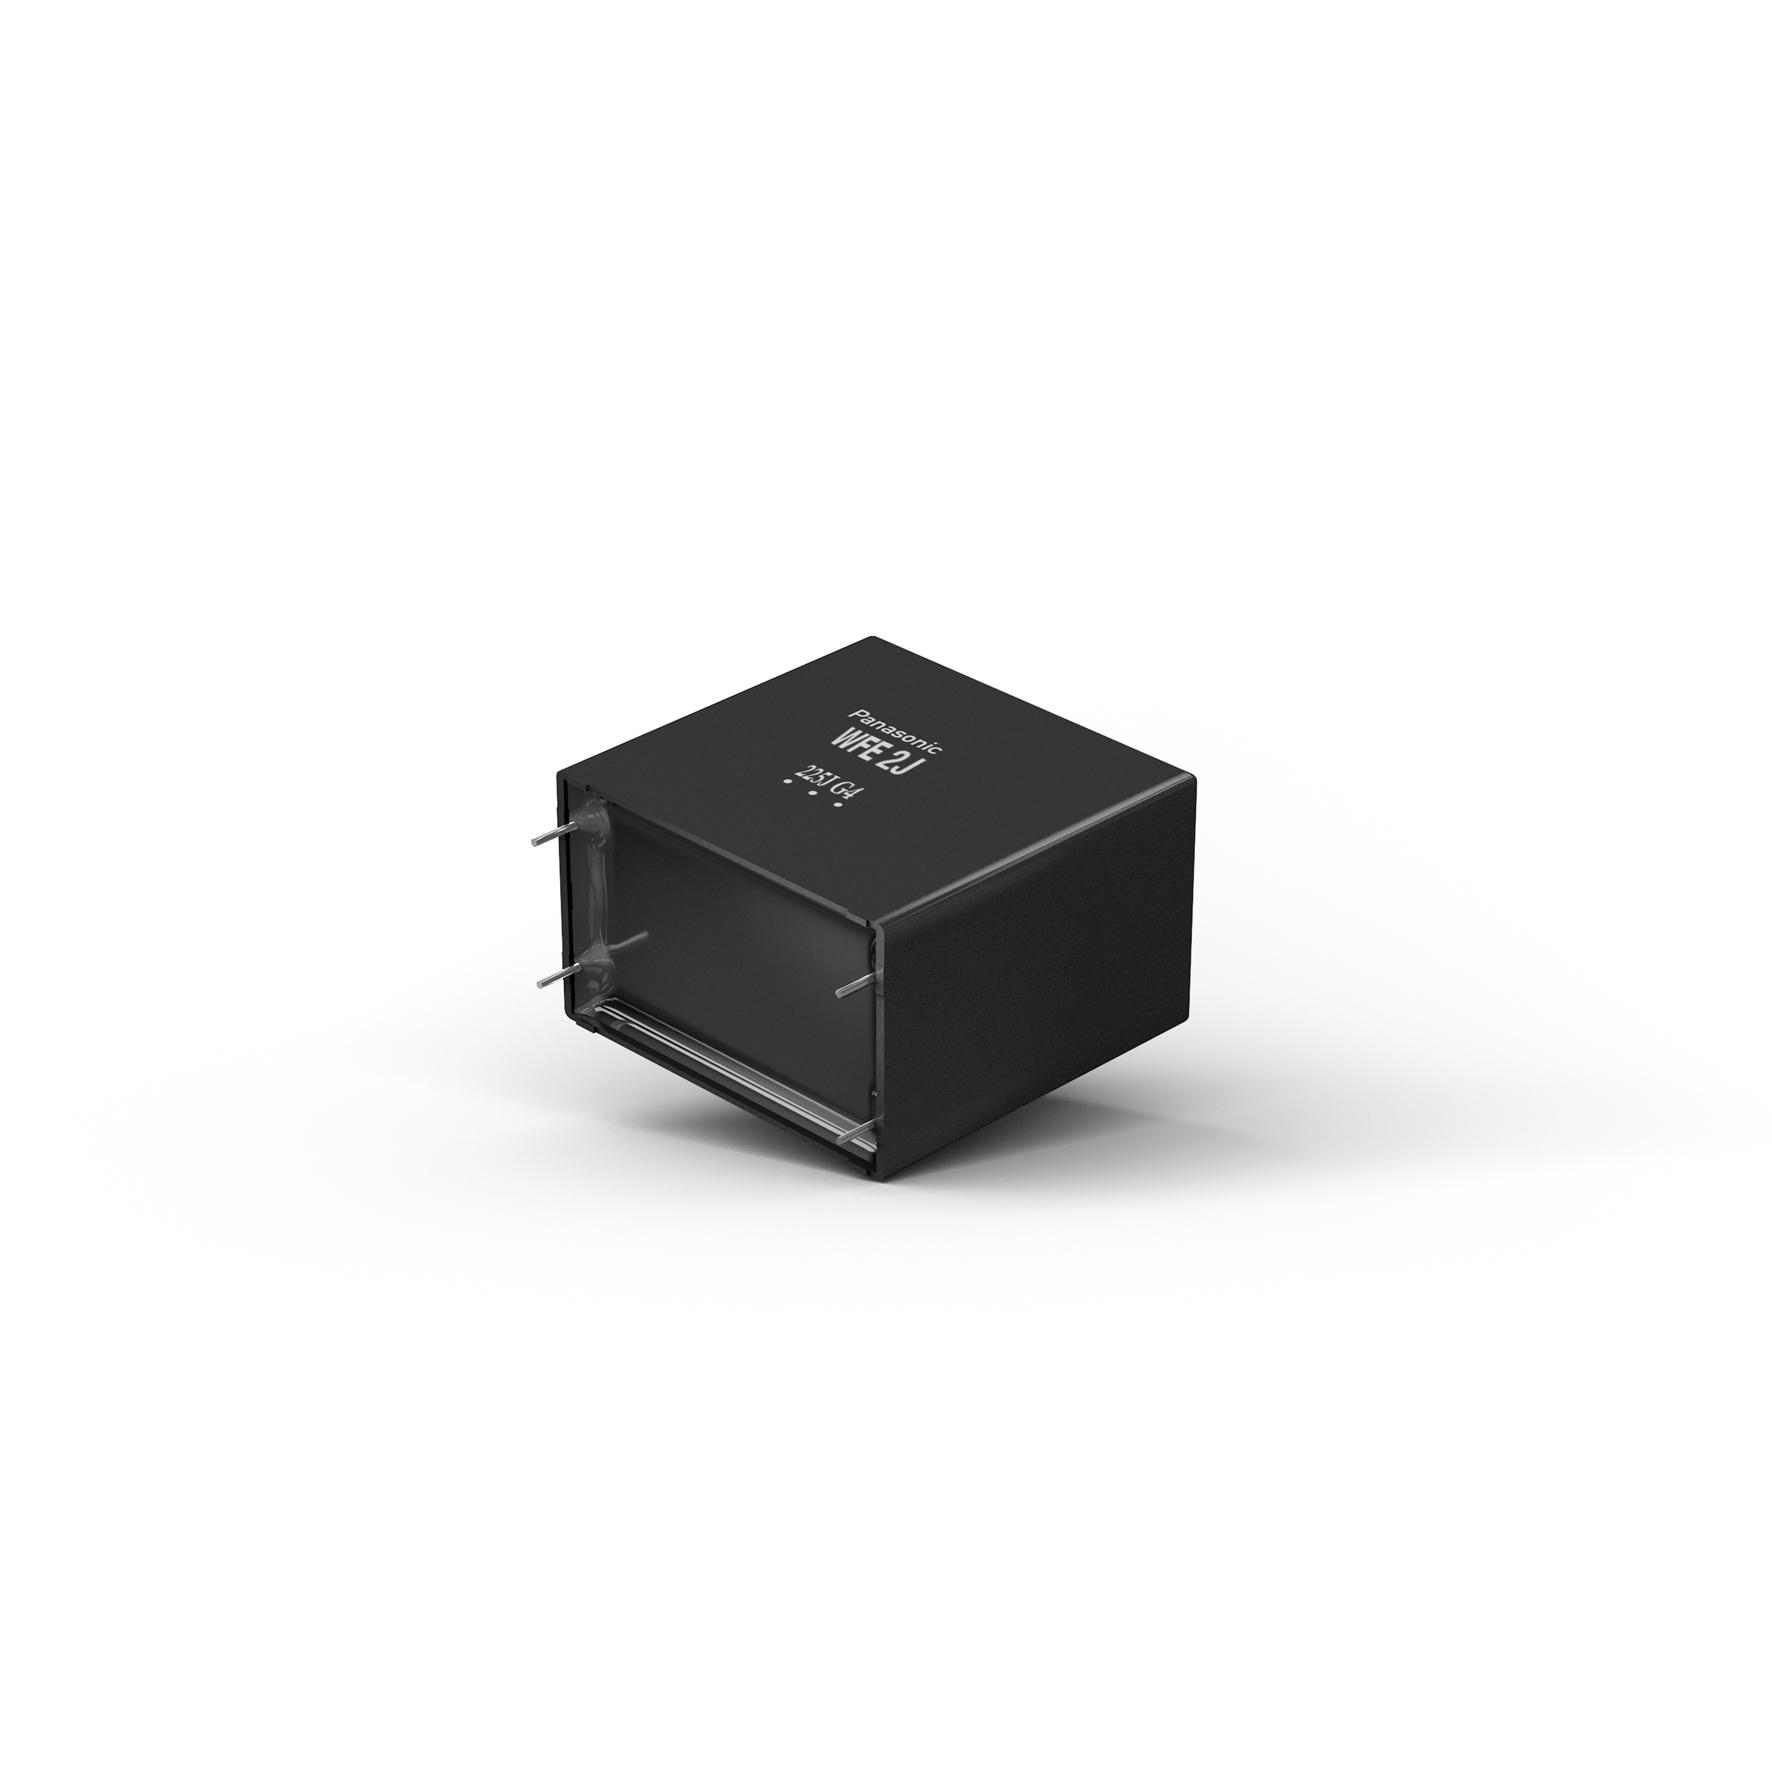 Metalised Polypropylene film capacitor